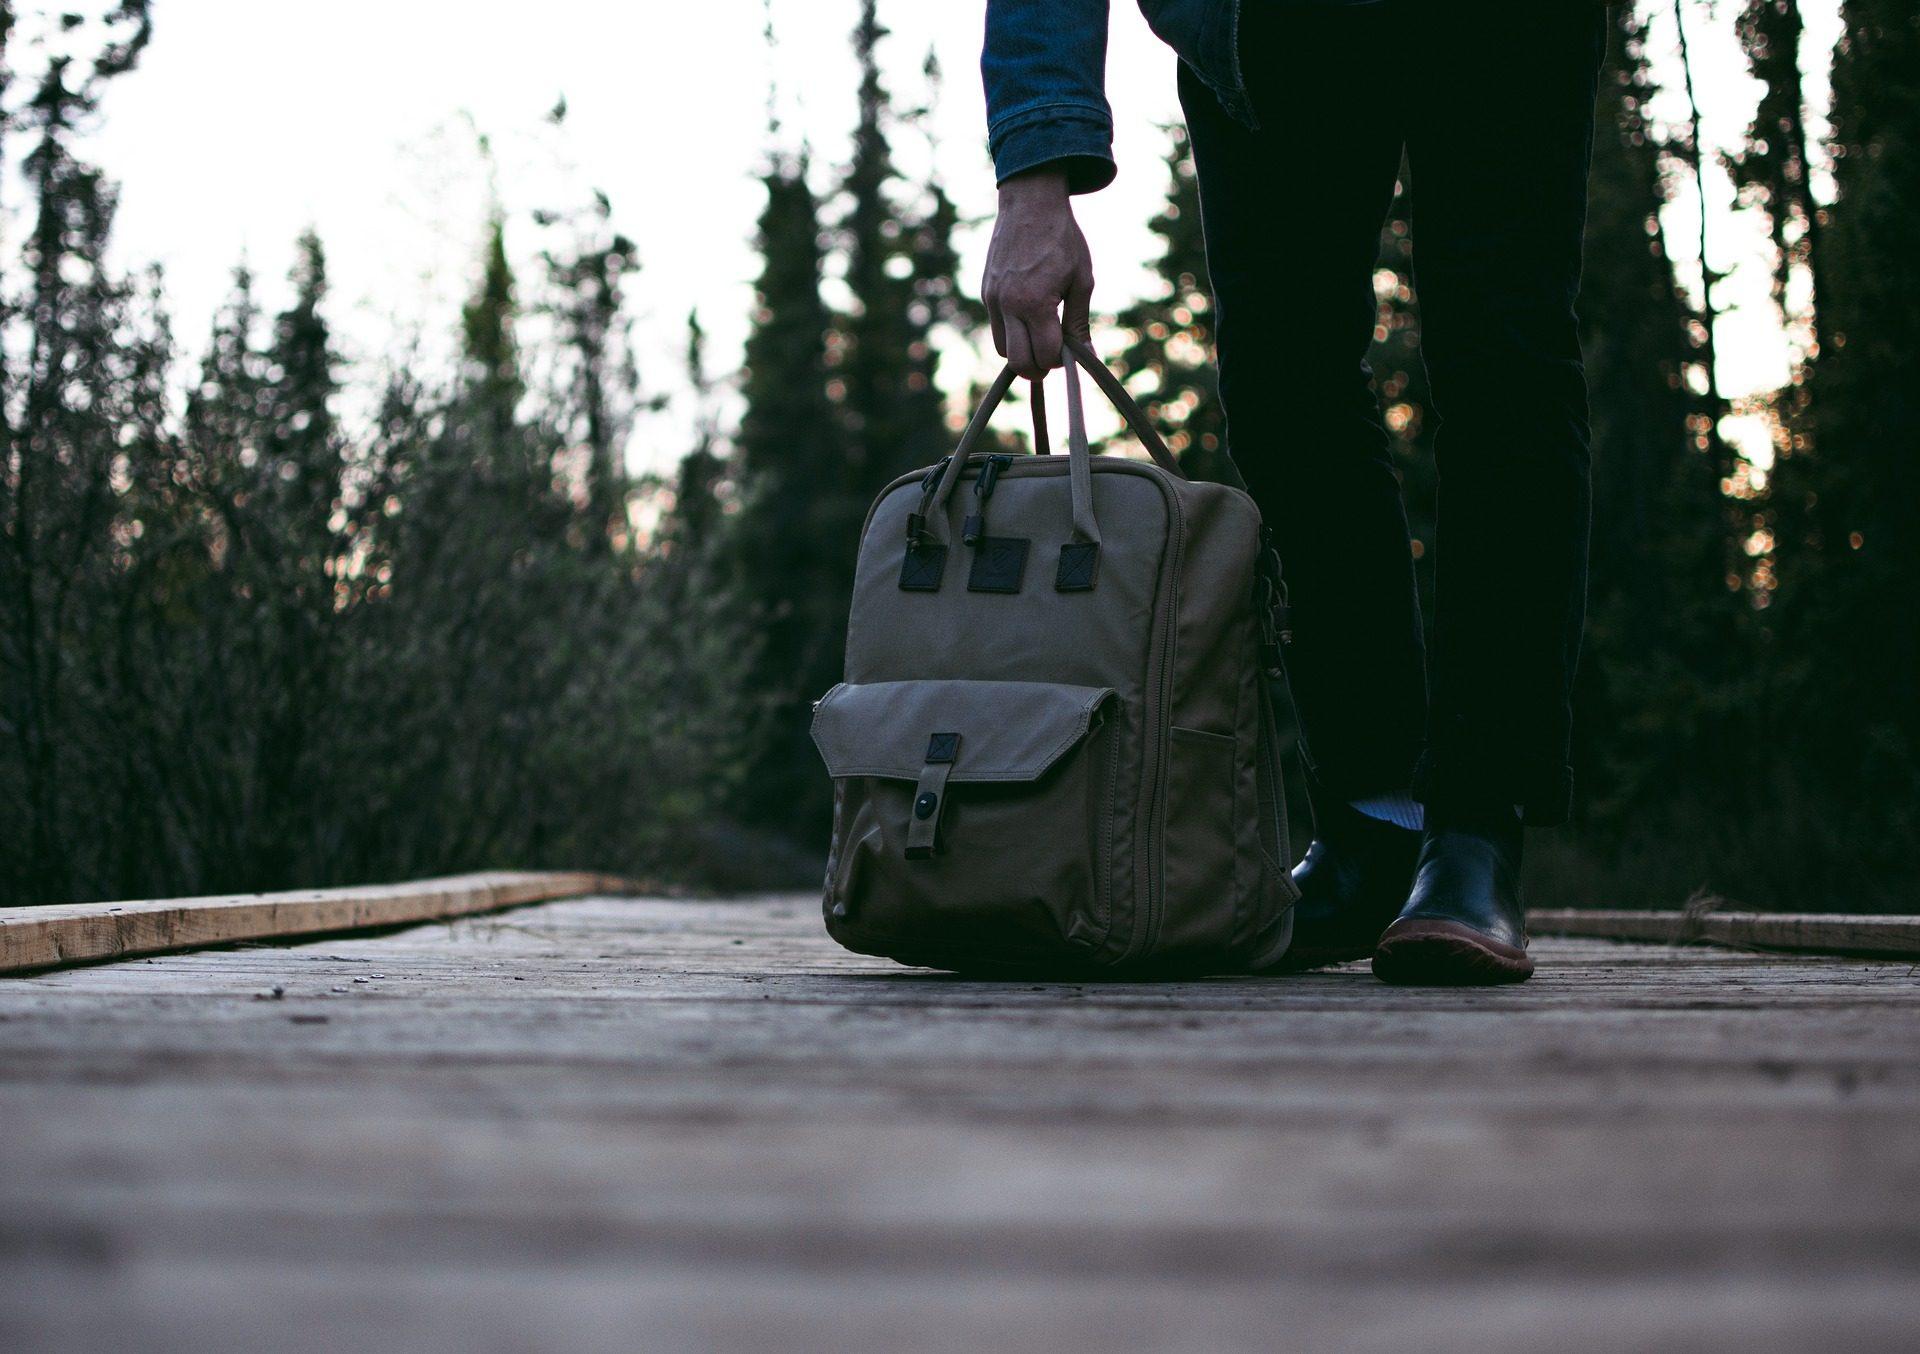 Sac à dos, sac, homme, arbres, Route, Sentier - Fonds d'écran HD - Professor-falken.com